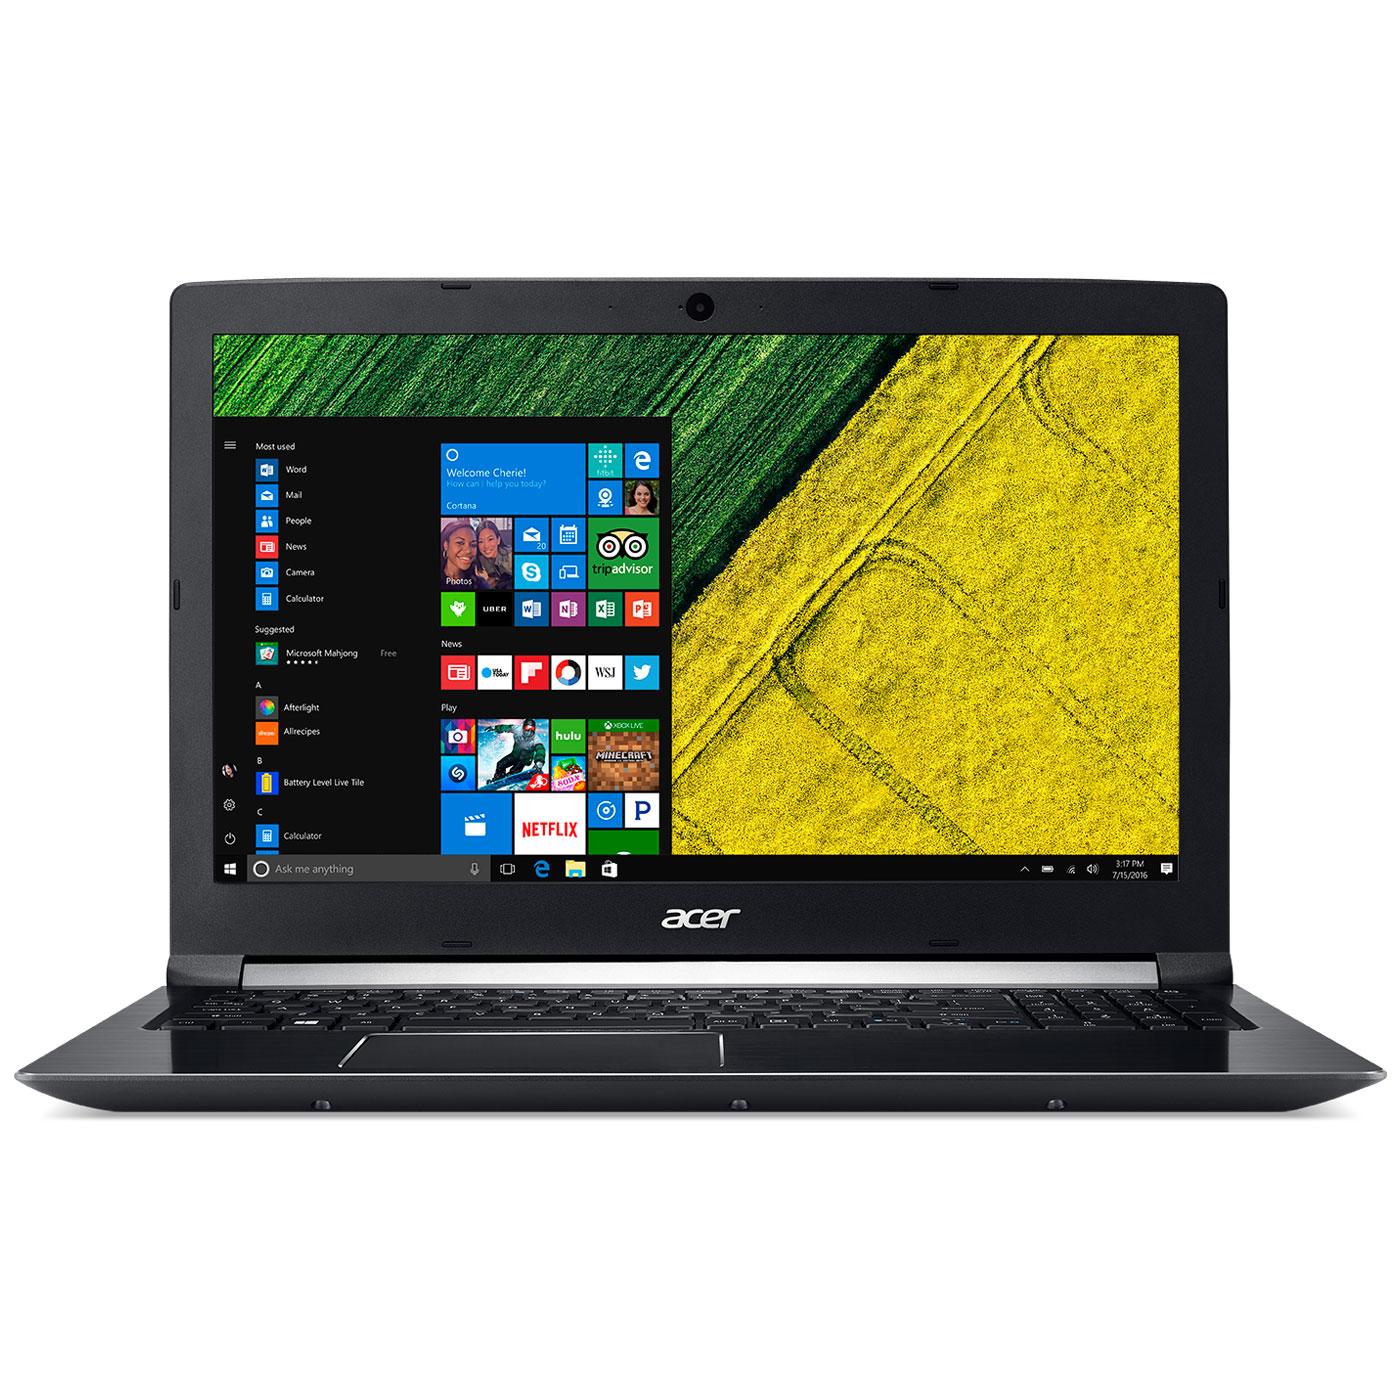 Acer NX.GP8EF.003 - PC portable Acer - Cybertek.fr - 3